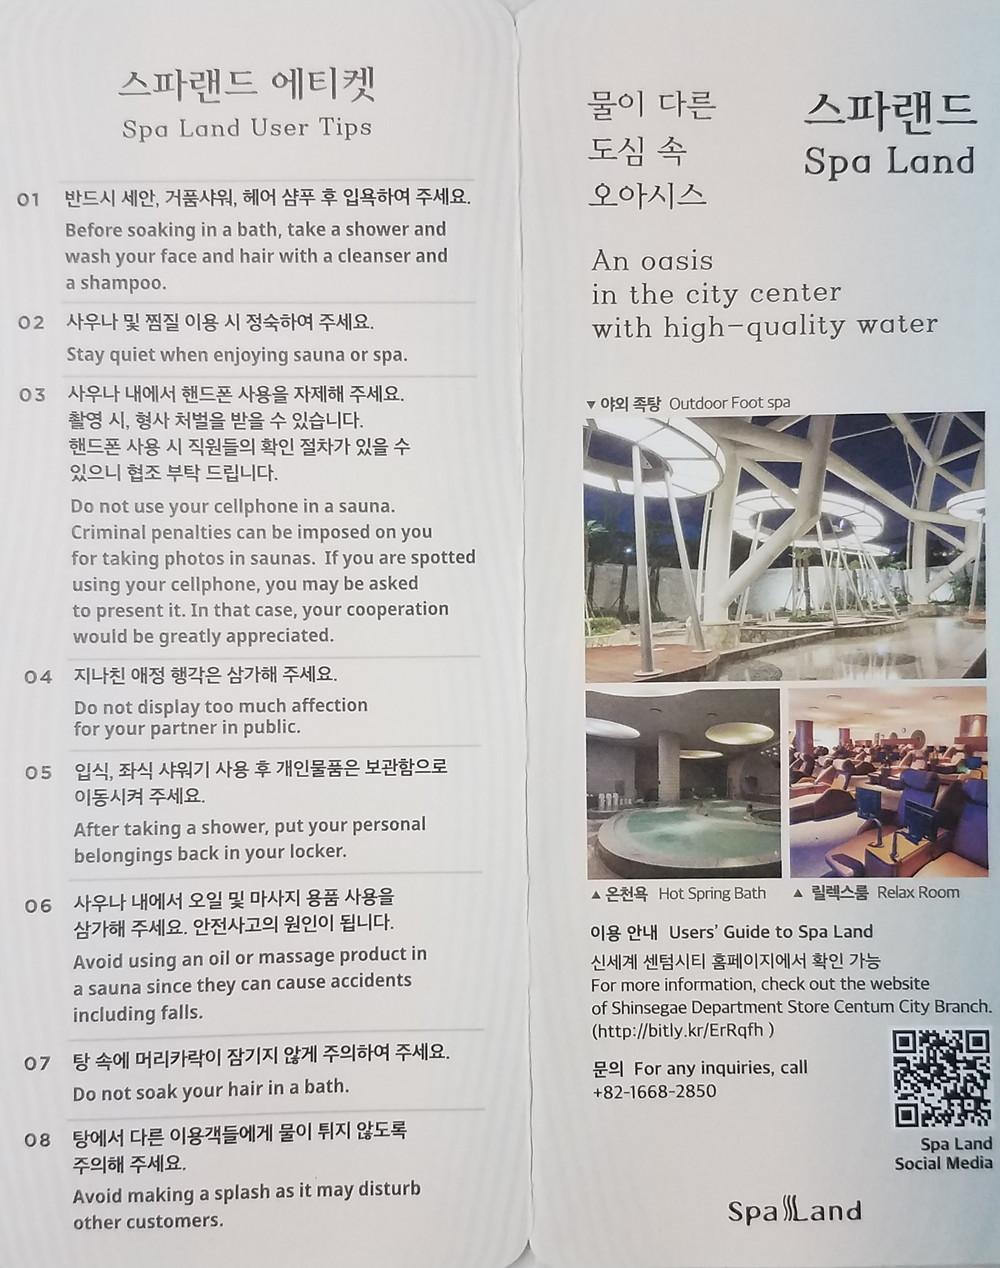 Busan's Spa Land user tips pamphlet